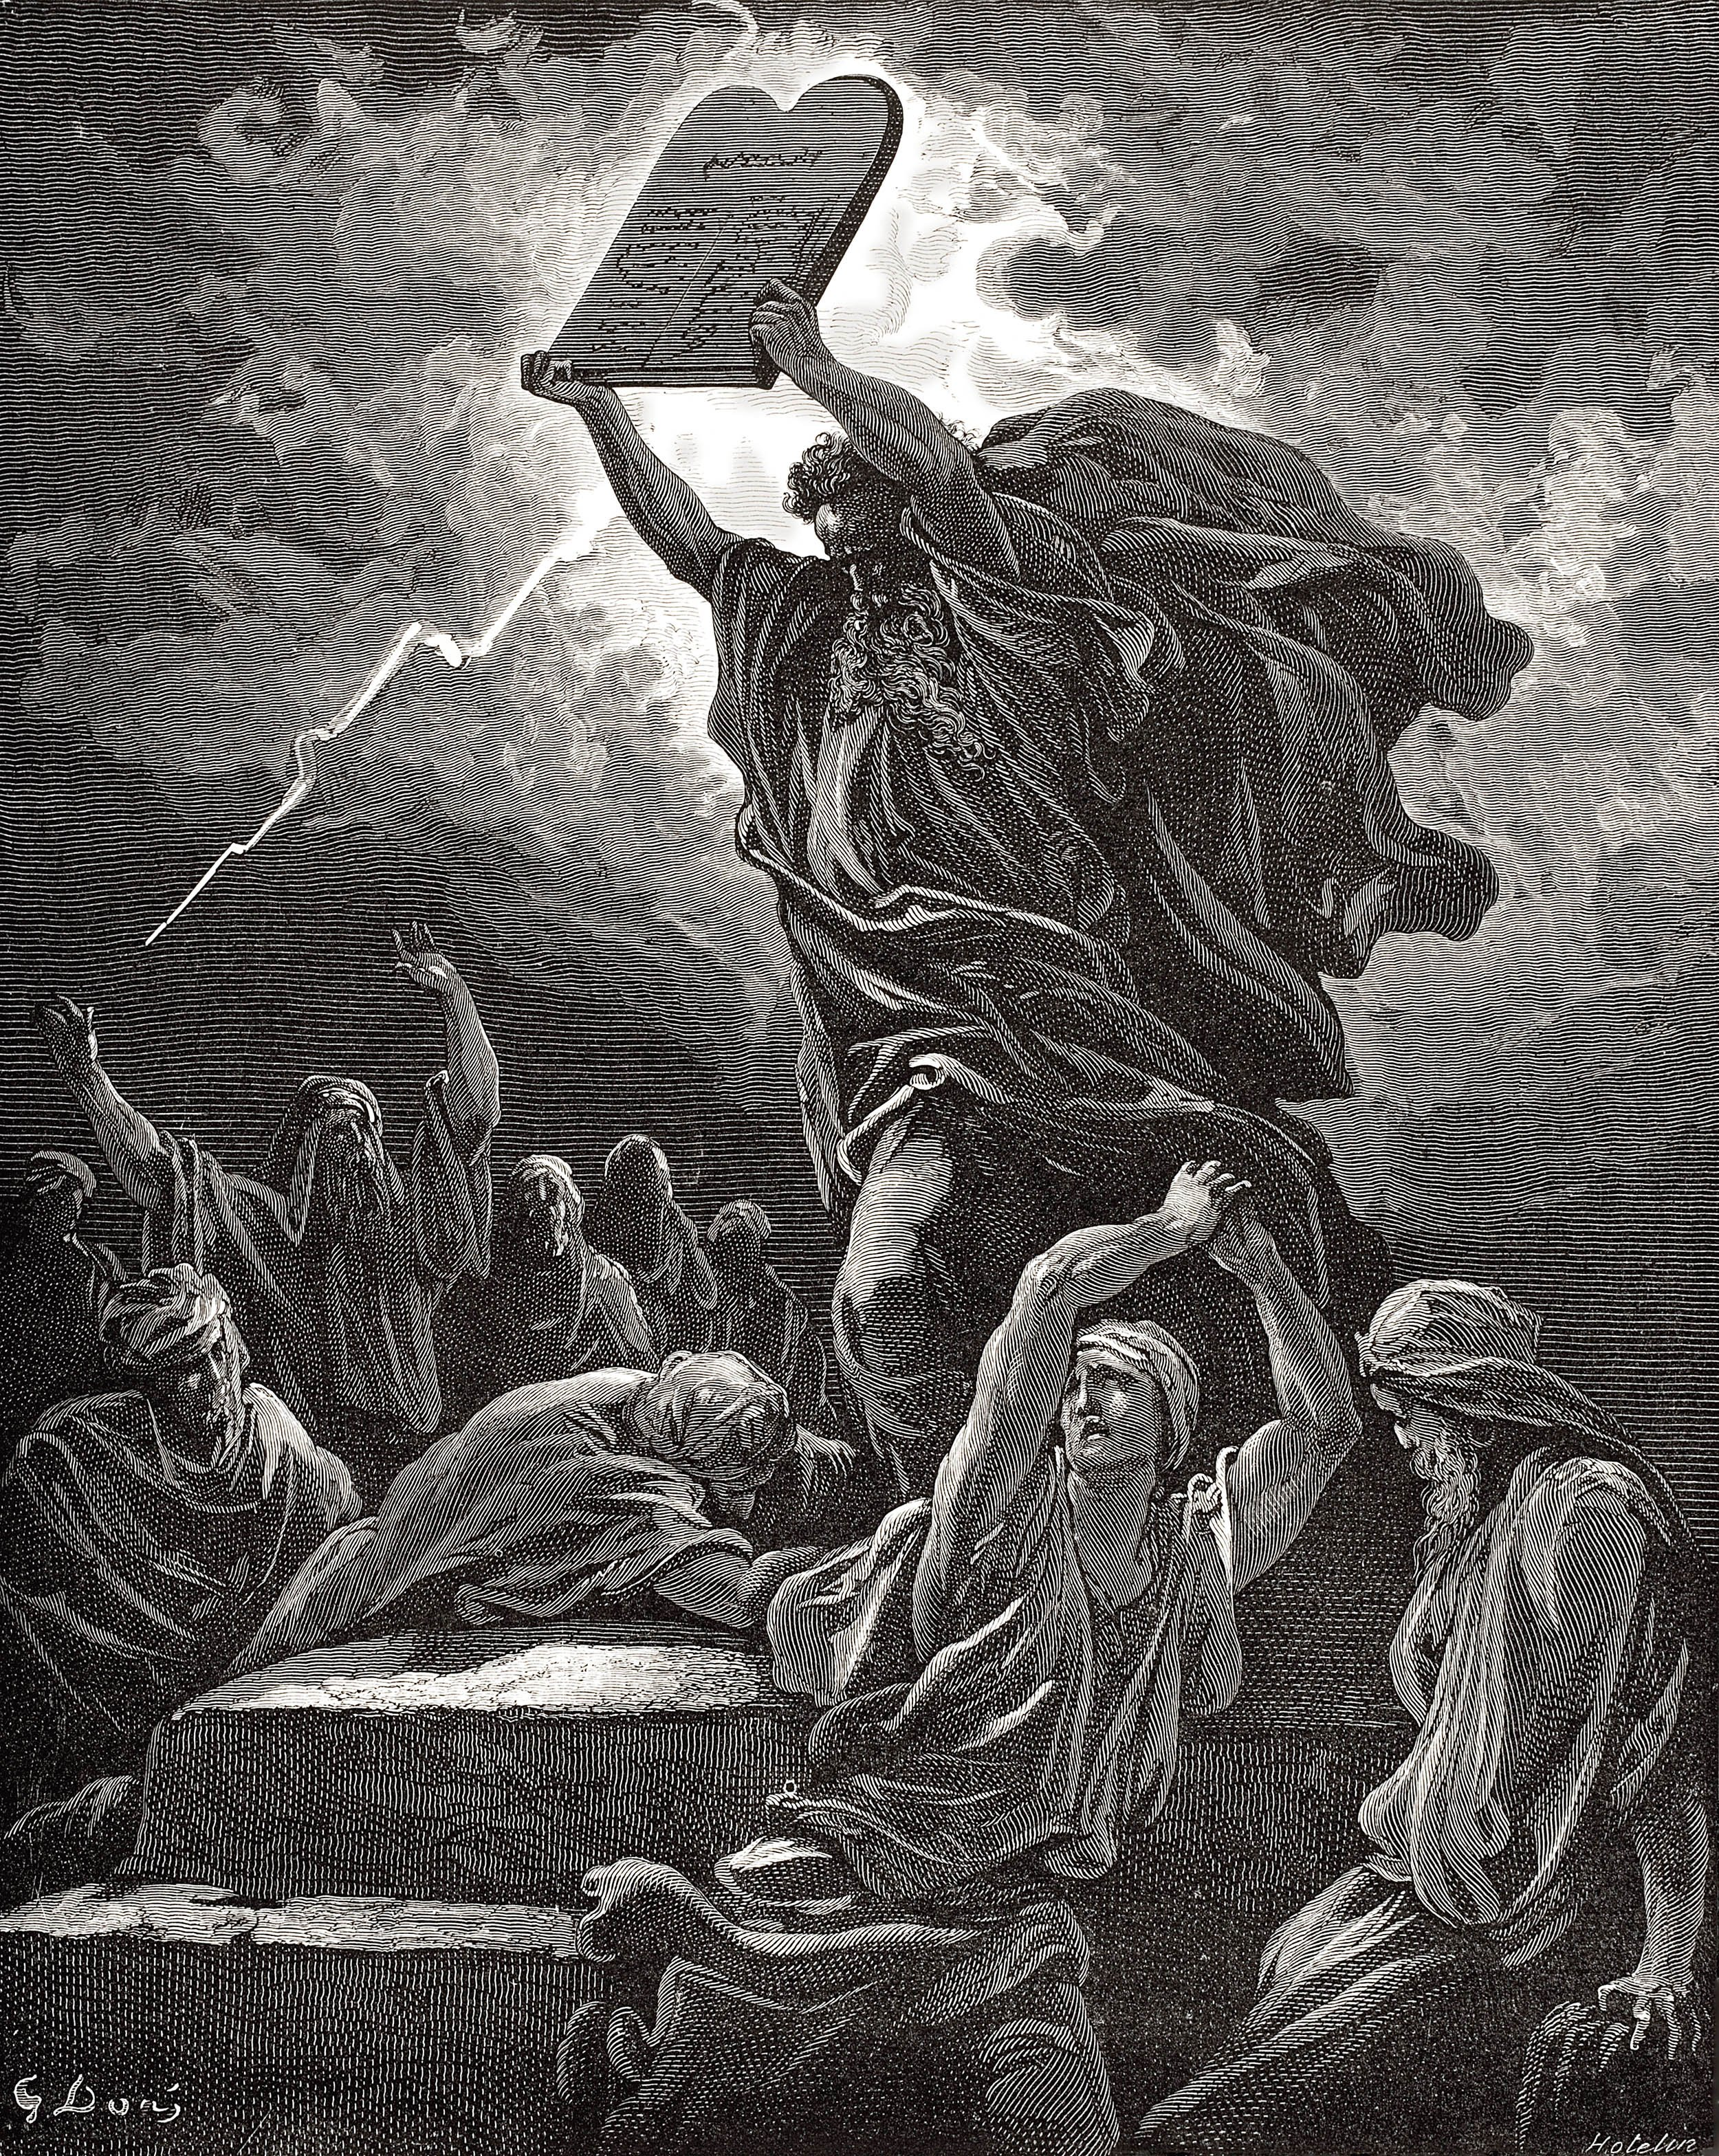 Sodomy: The History of a Christian Biblical Myth